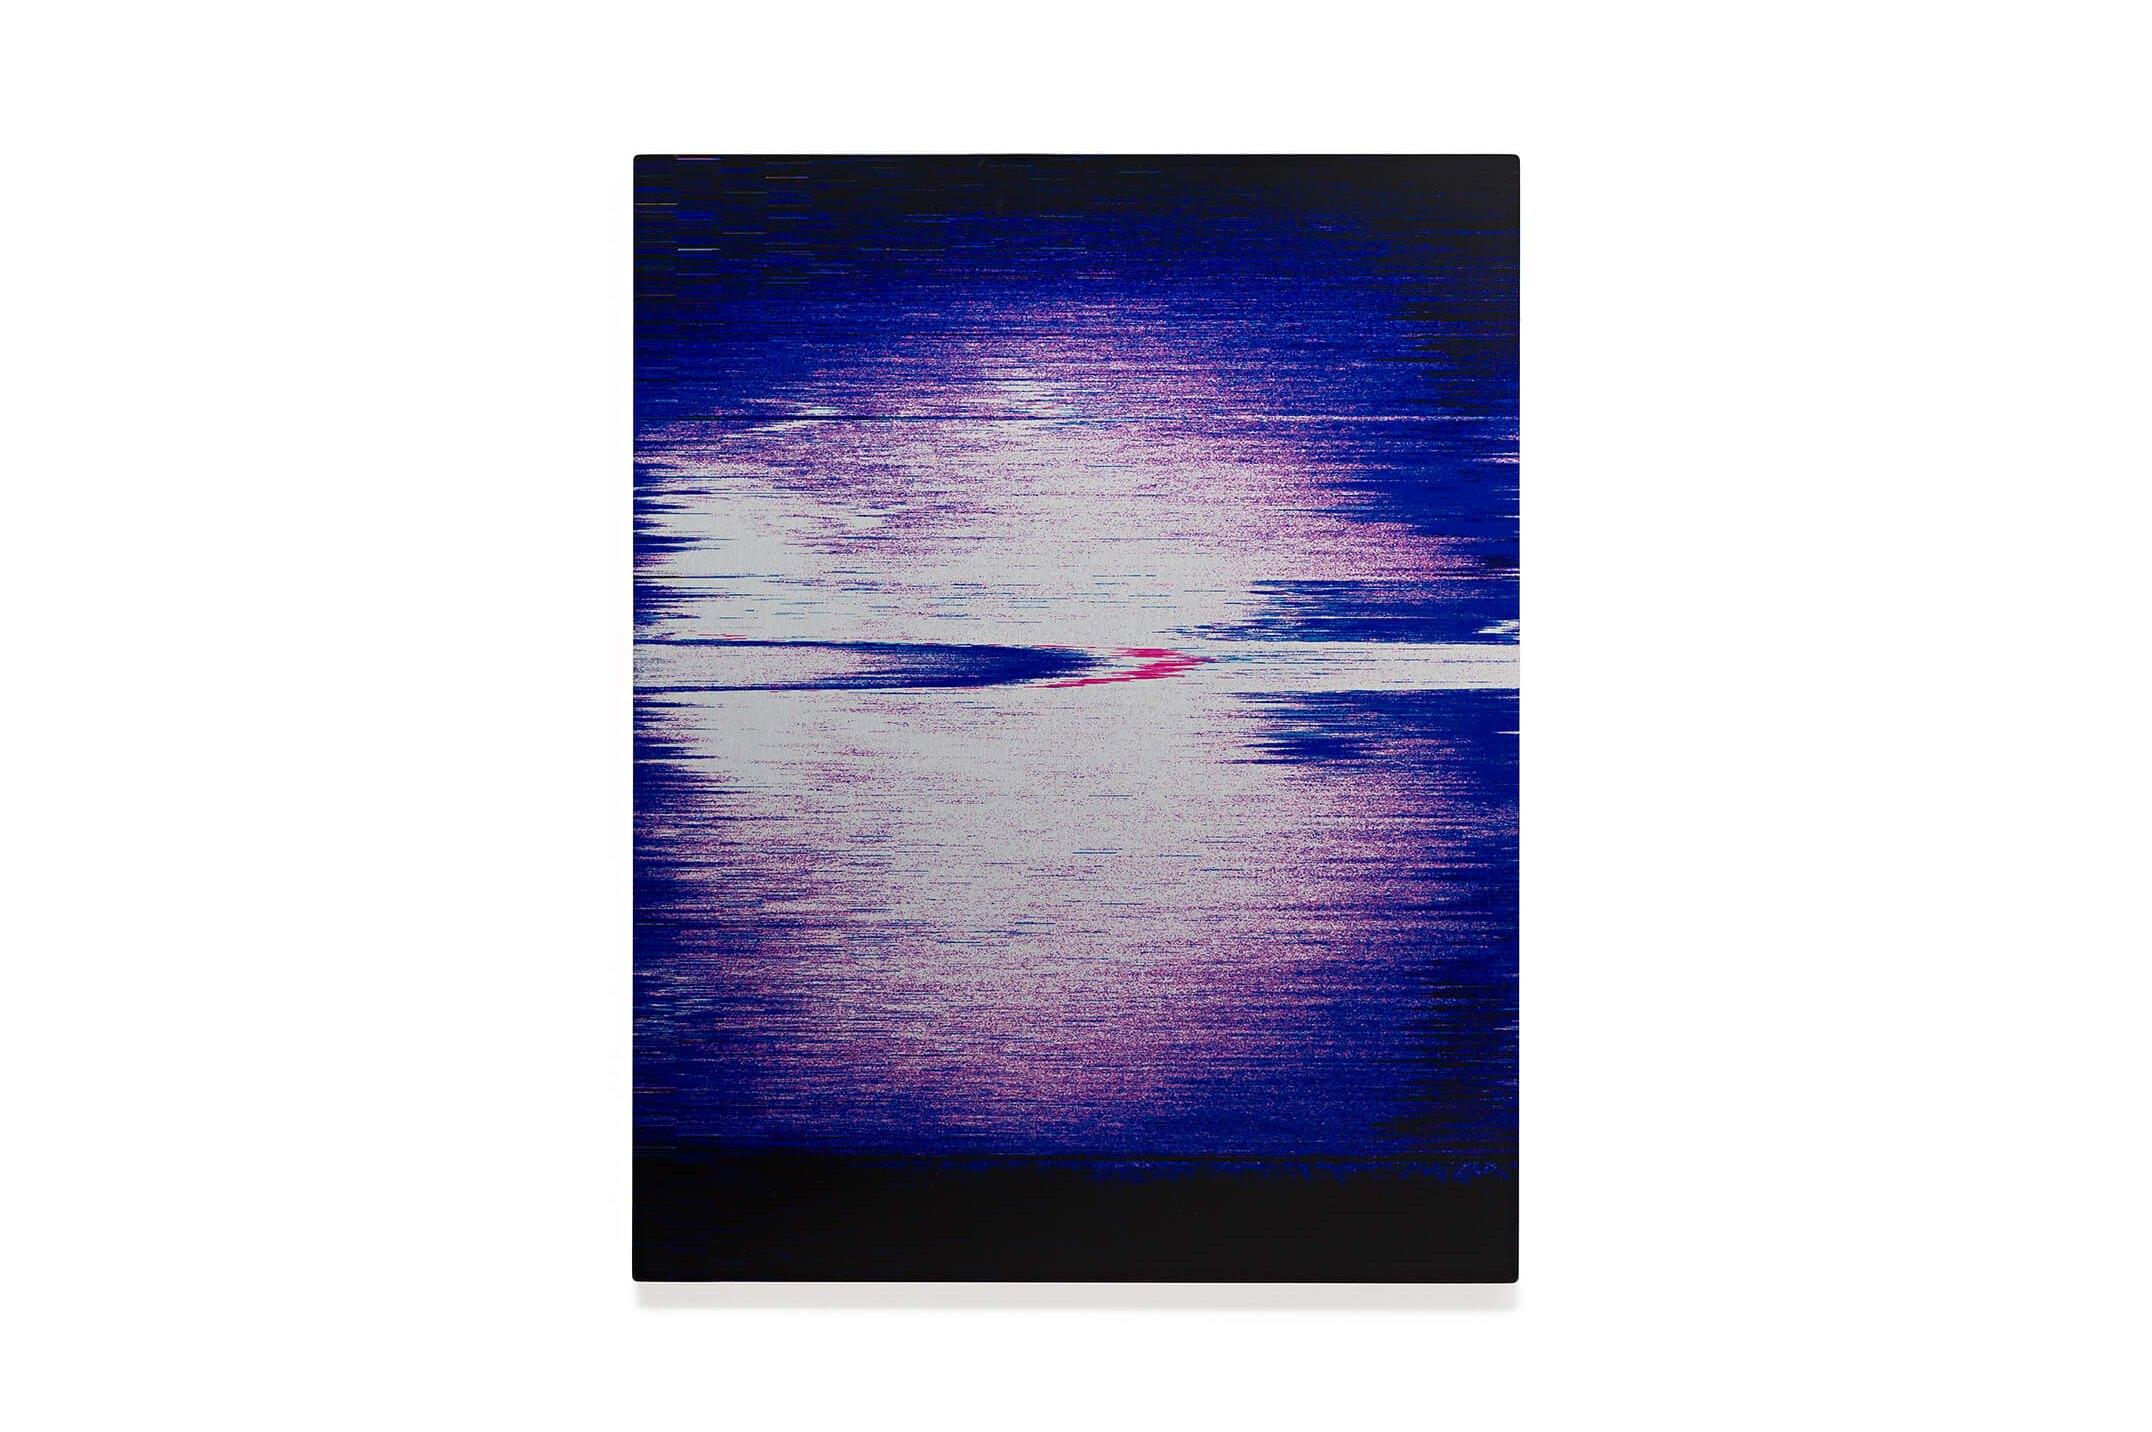 James Hoff,<em>Skywiper No. 16</em>, 2014,chromaluxe transfer on aluminum, 36 × 28 cm - Mendes Wood DM